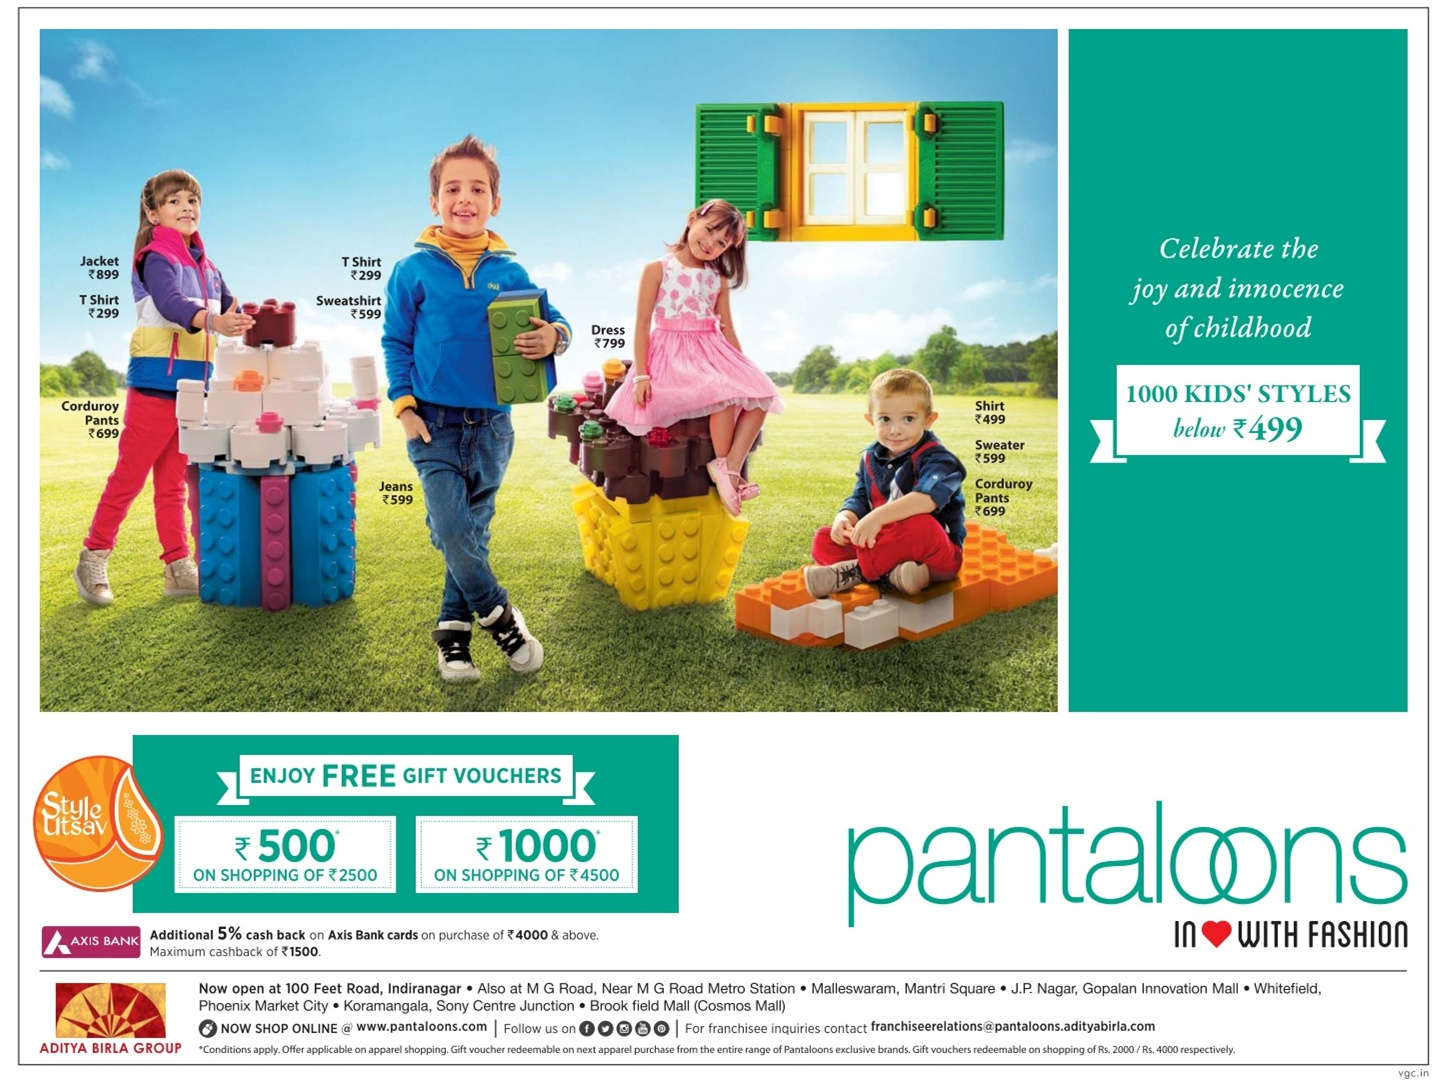 Pantaloons Kids - Free Gift Vouchers